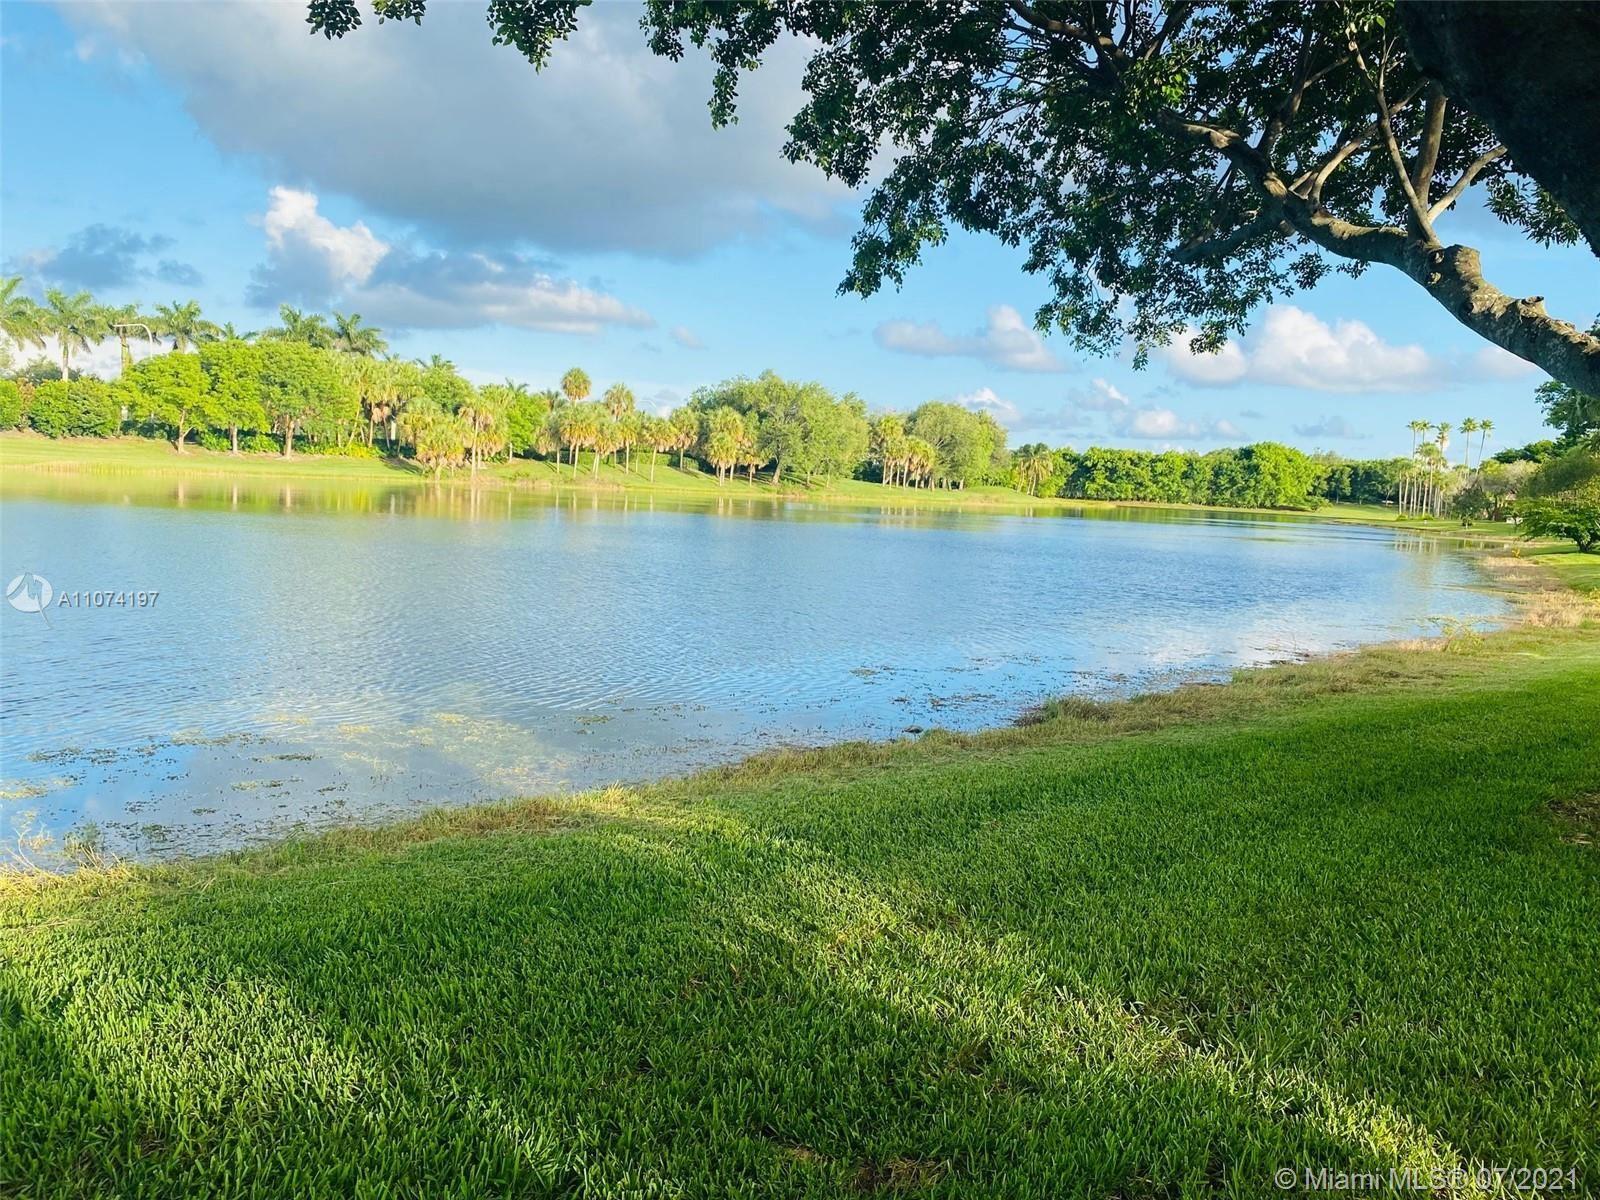 Photo of 2220 Tallahassee, Weston, FL 33326 (MLS # A11074197)